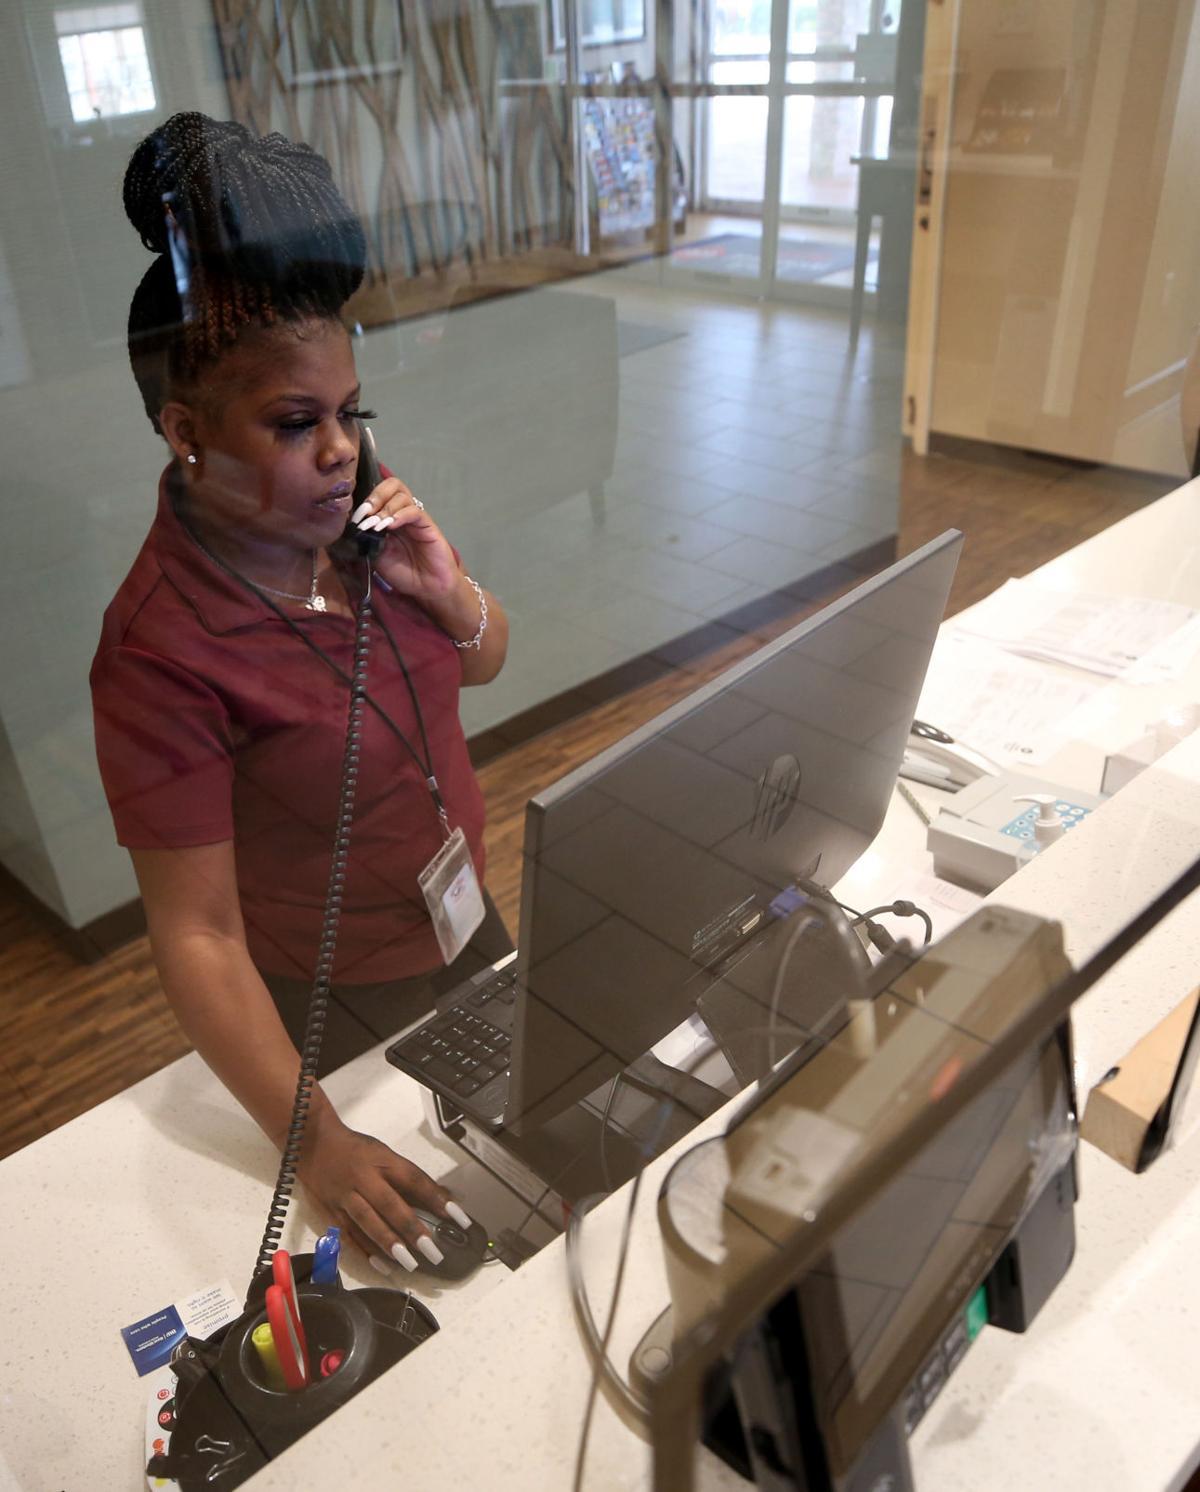 Hotel rates rising as demand increases